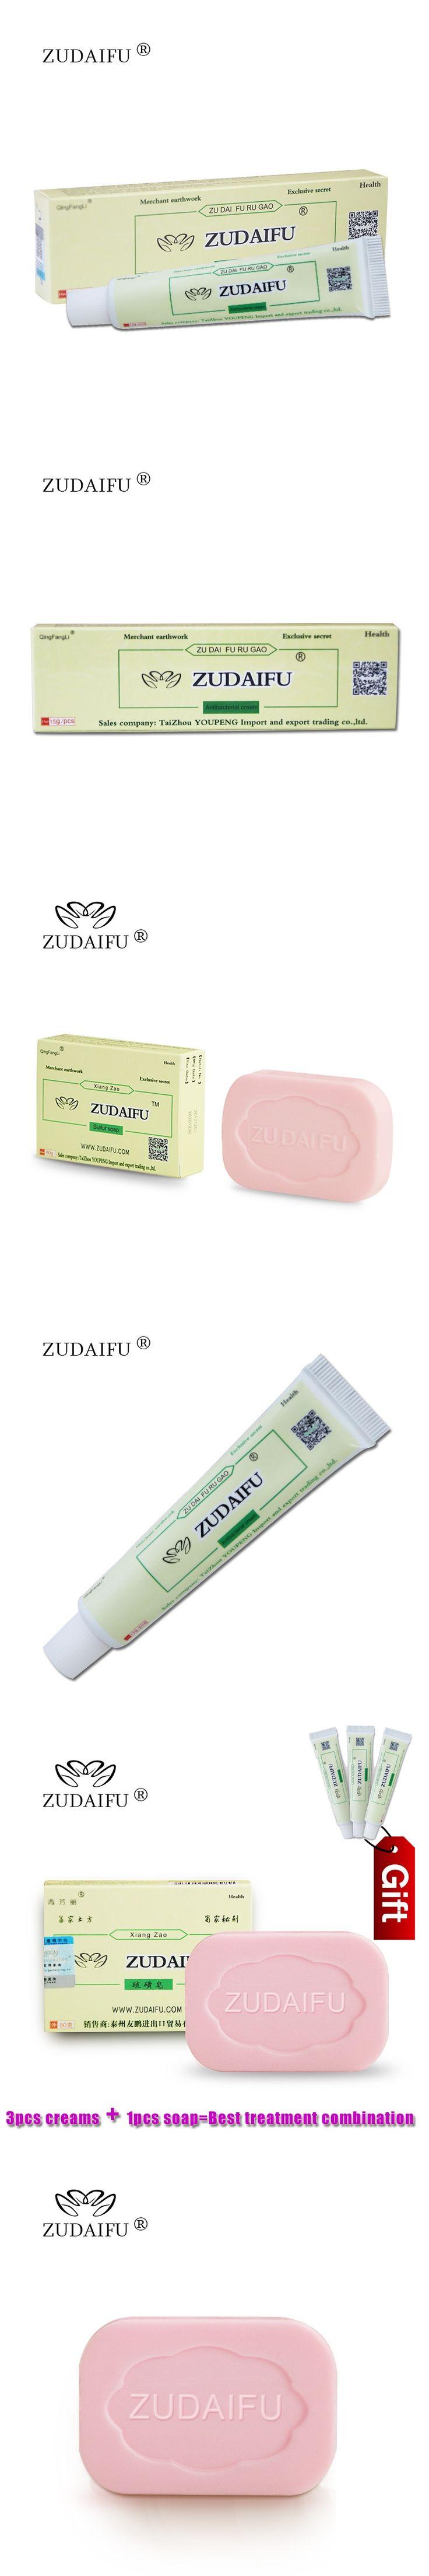 1pcs zudaifu Sulfur Soap Skin  Acne Psoriais Seborrhea Eczem Anti Fungus Bath whitening soap shampoo soap making+GIF